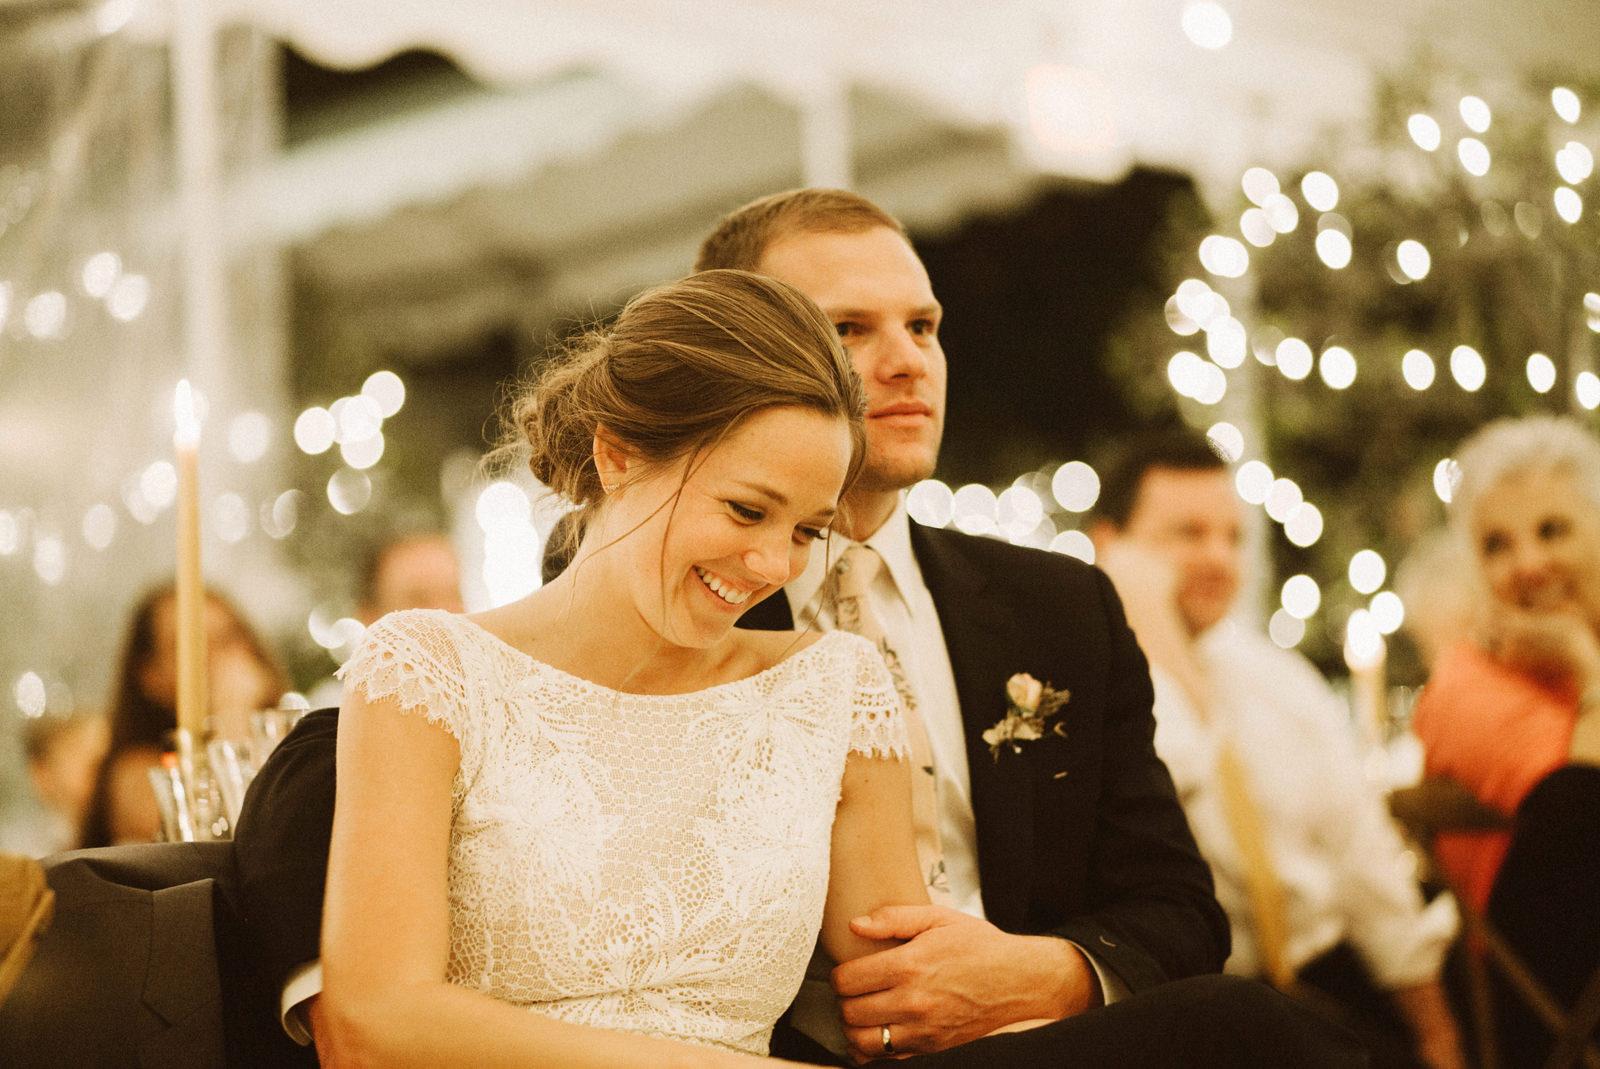 bridgeport-wedding-157 BRIDGEPORT, CONNECTICUT BACKYARD WEDDING